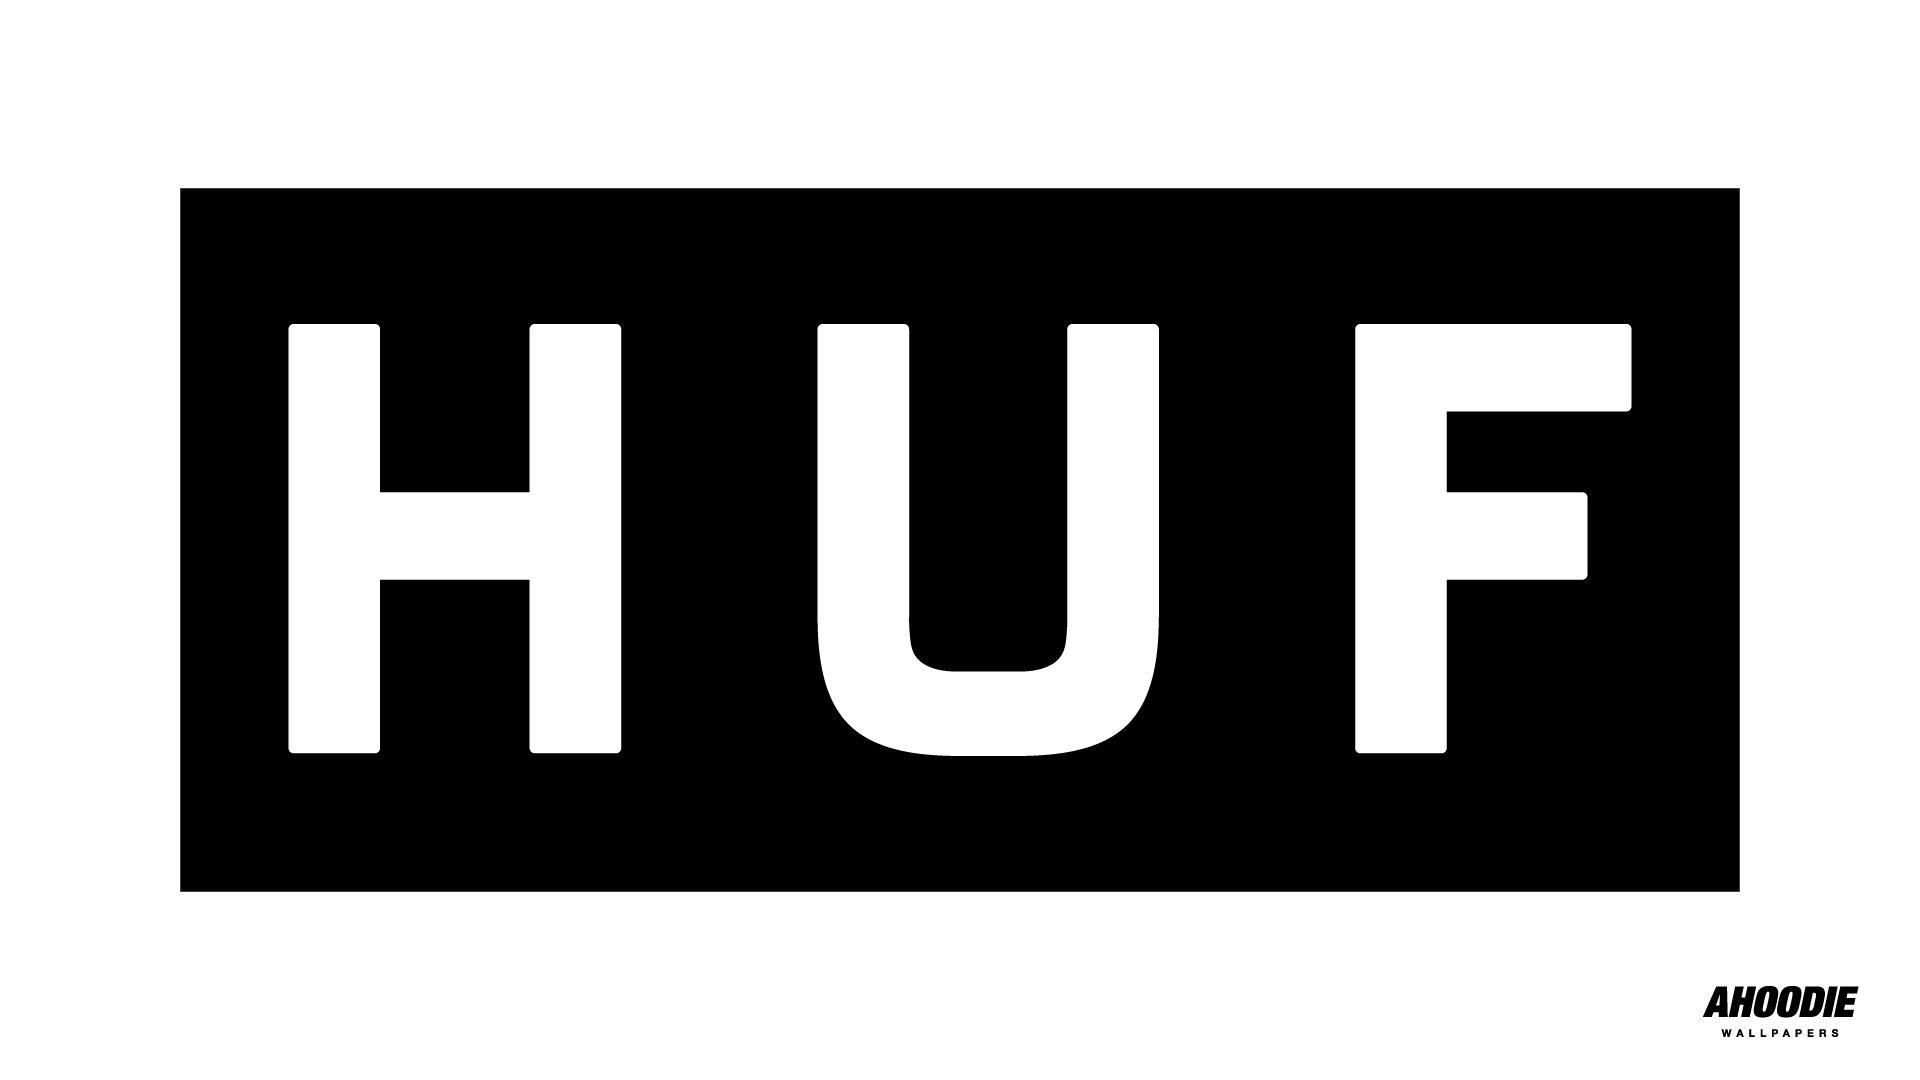 Huf Desktop Wallpaper Jpeg 1 920 1 080 Pixels Gambar